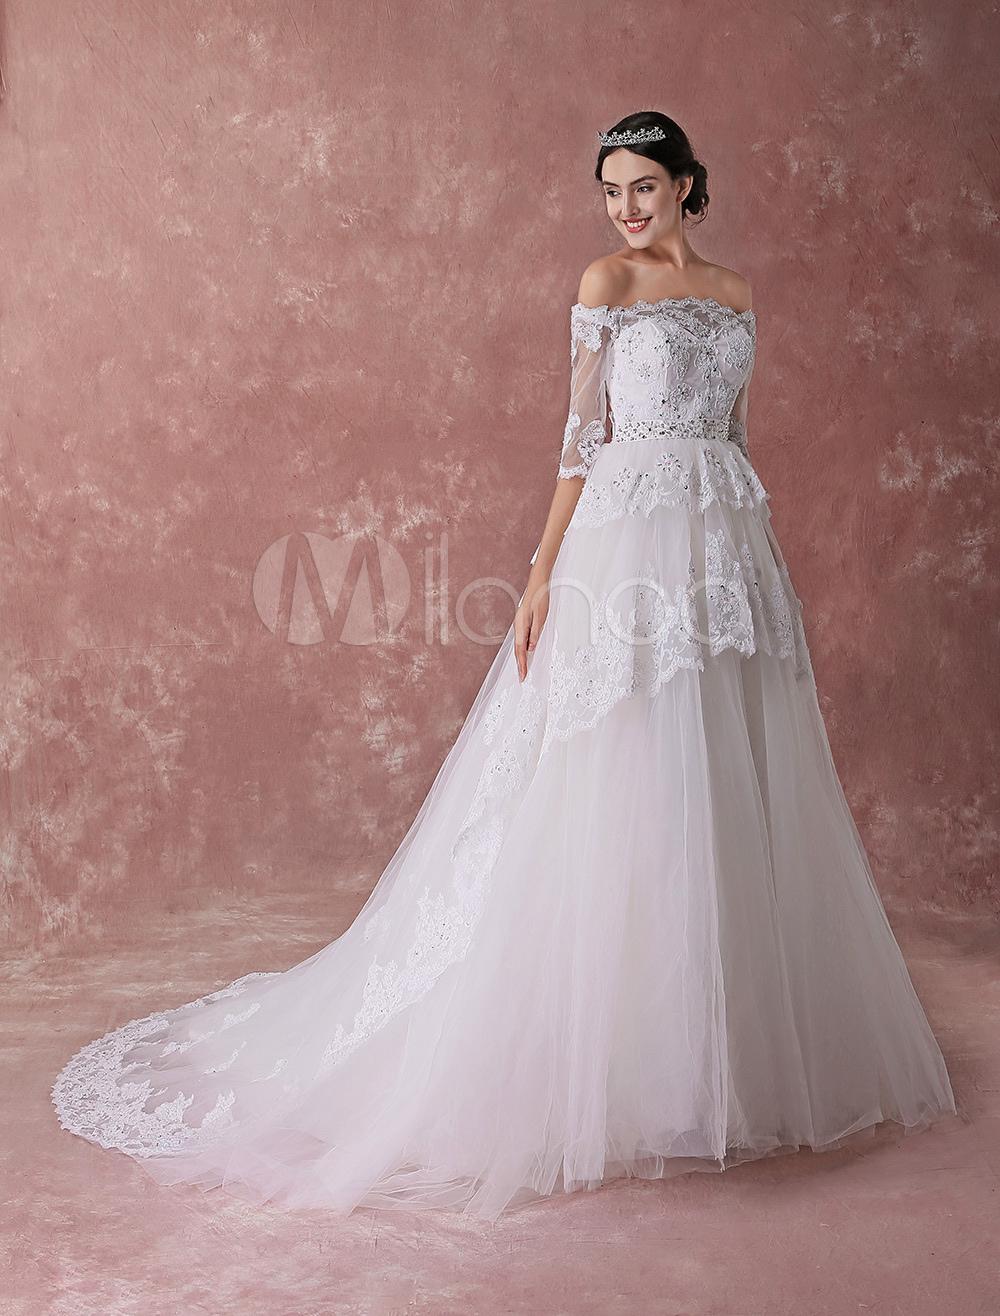 Princess Ball Gown Wedding Dresses White Off Shoulder Bridal Dress ...